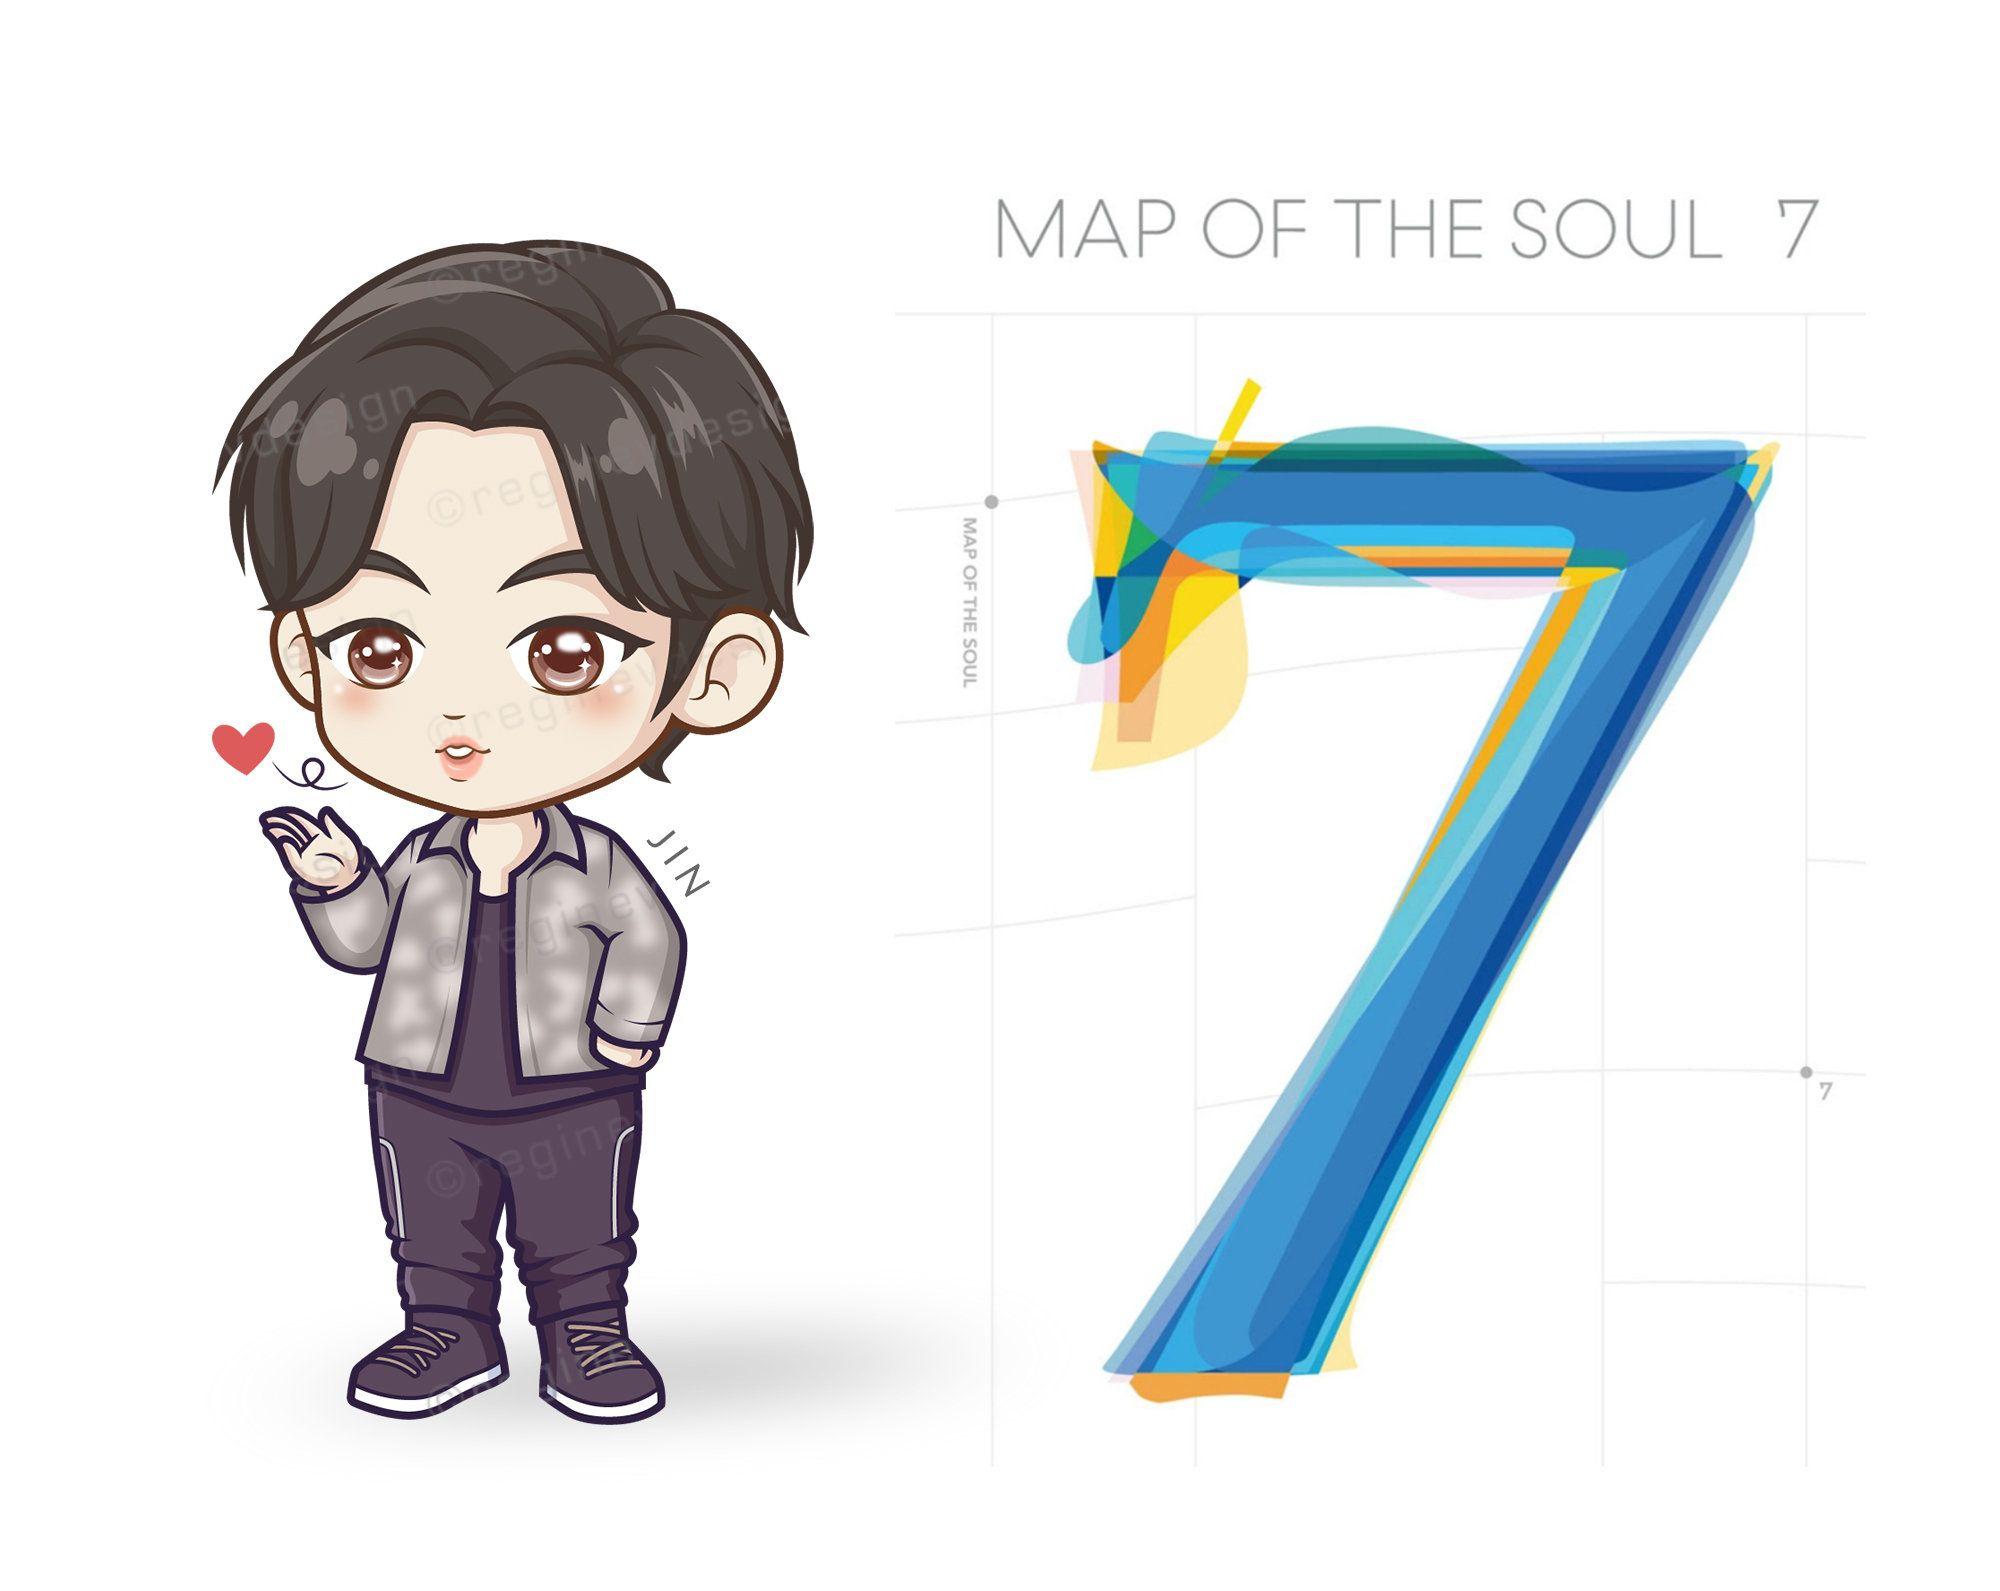 Bts Jin Chibi Kawaii Cartoon Clipart K Pop Ji Seok Jin Etsy Bts Jin Chibi Cartoon Clip Art